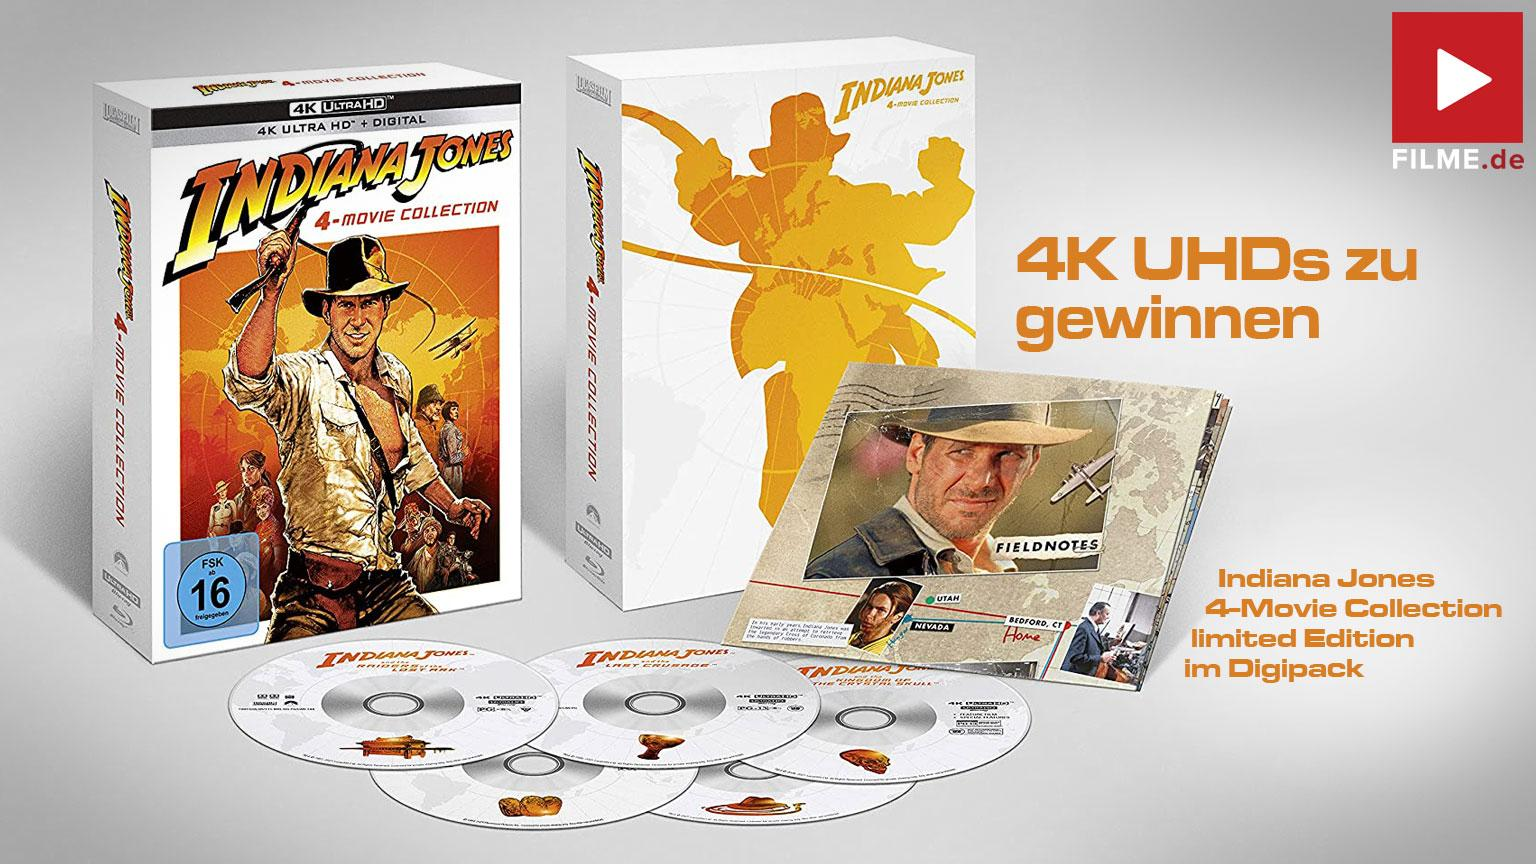 Indiana Jones – 4-Movie Collection als 4K UHD Digipak Gewinnspiel gewinnen Artikelbild